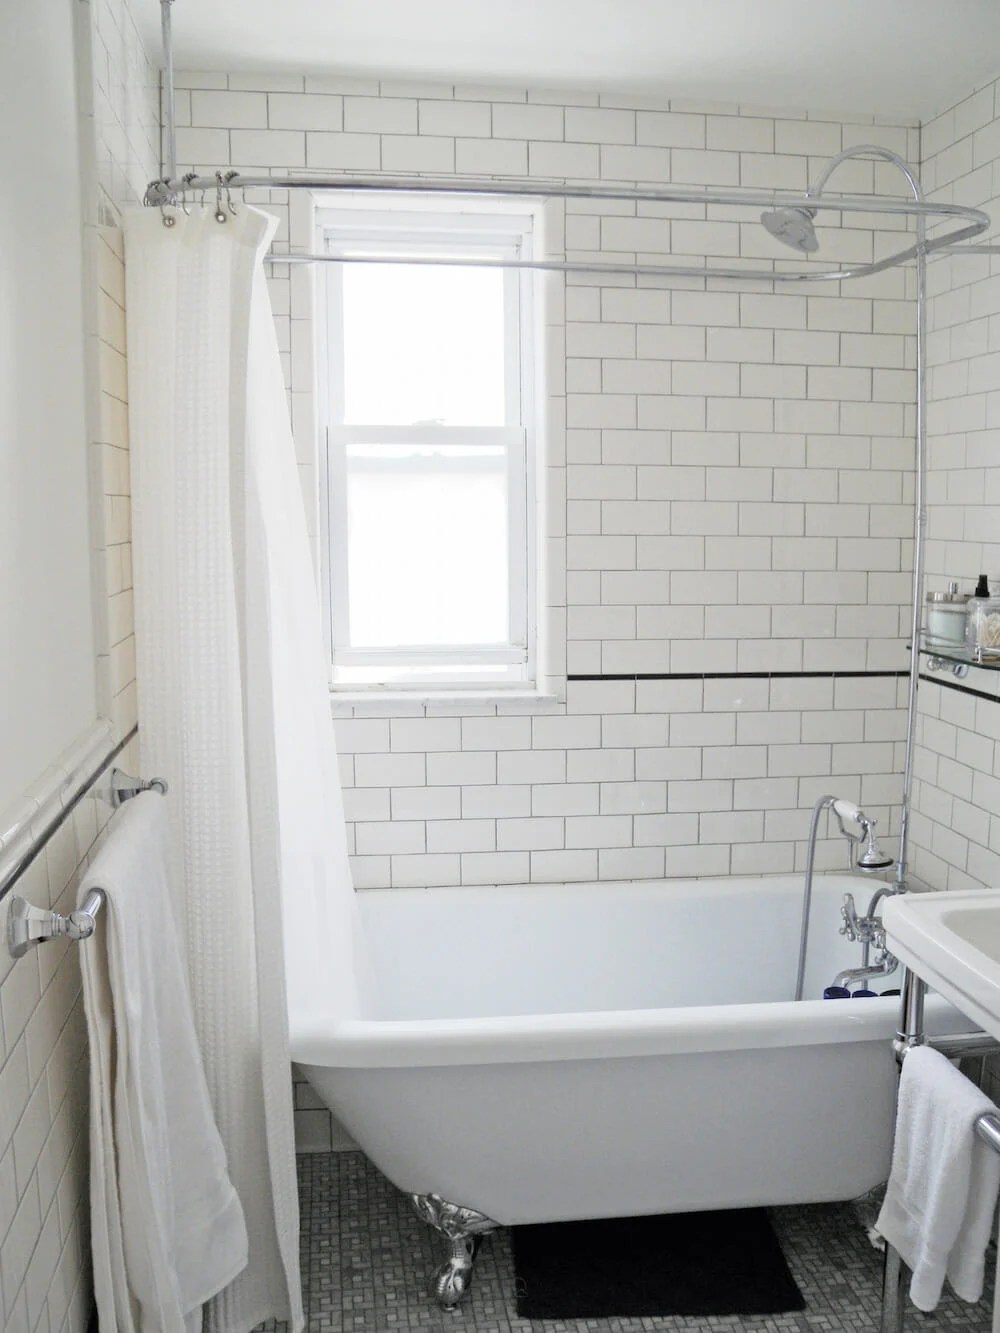 bathroom renovation costs in the 15k